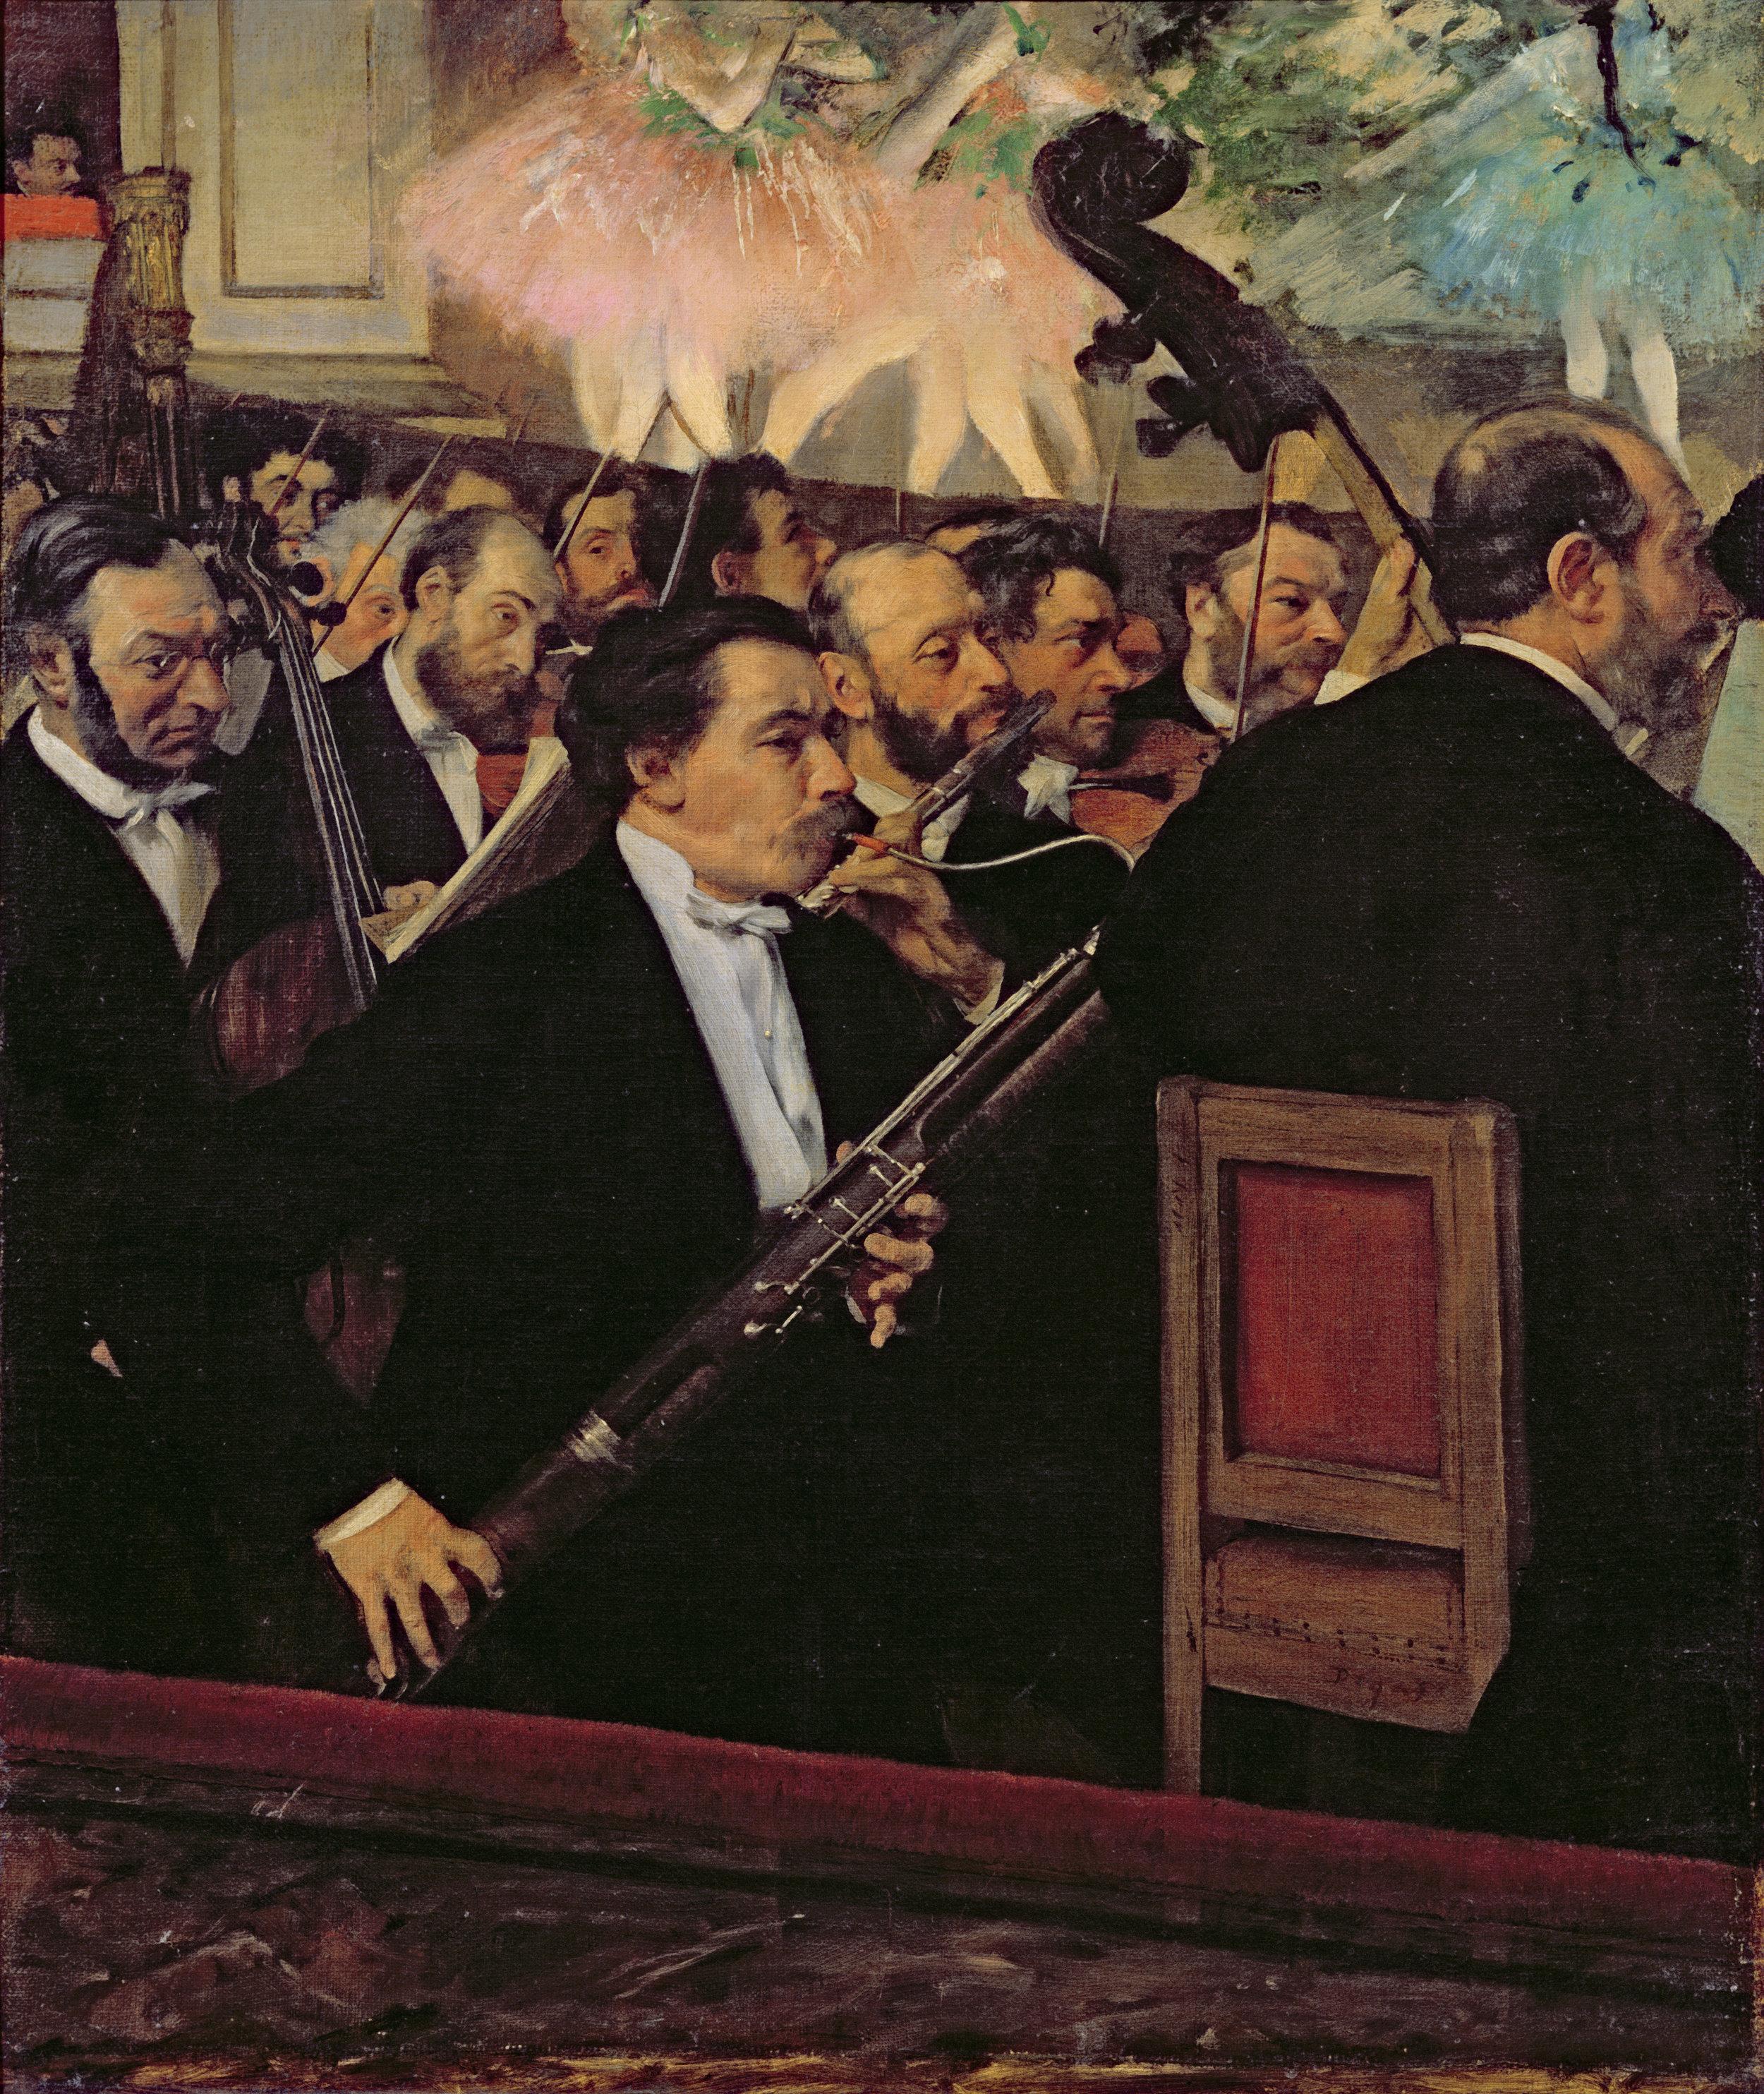 The Orchestra at the Opera, c.1870, Degas, Edgar, Musee d'Orsay, Paris, Bridgeman Images.jpg